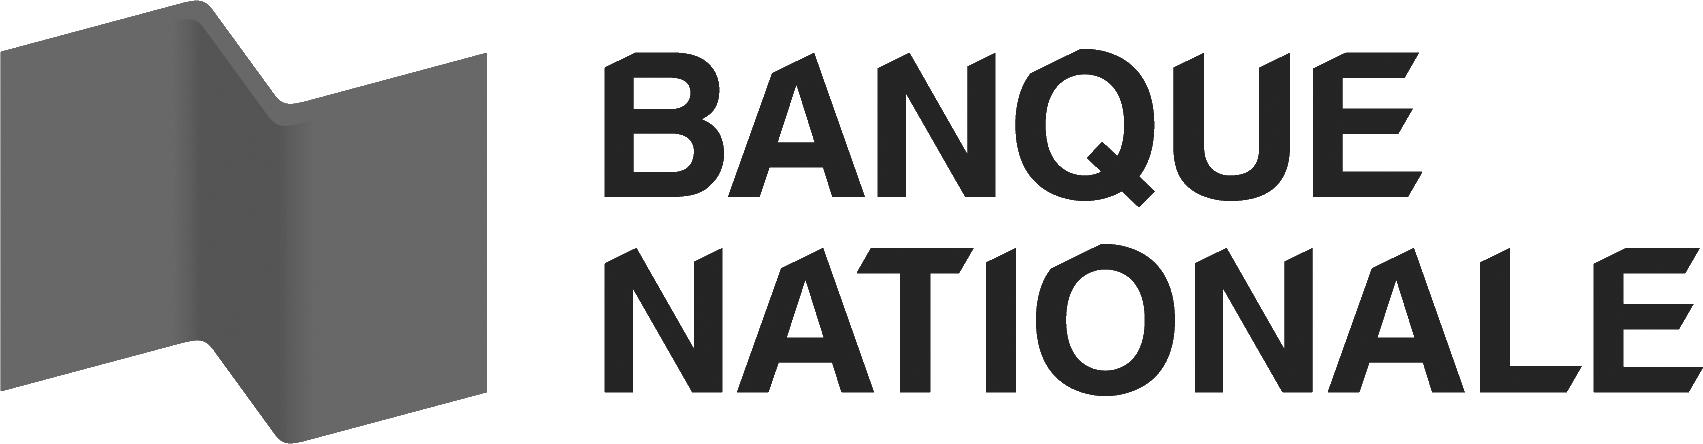 Banque Nationale